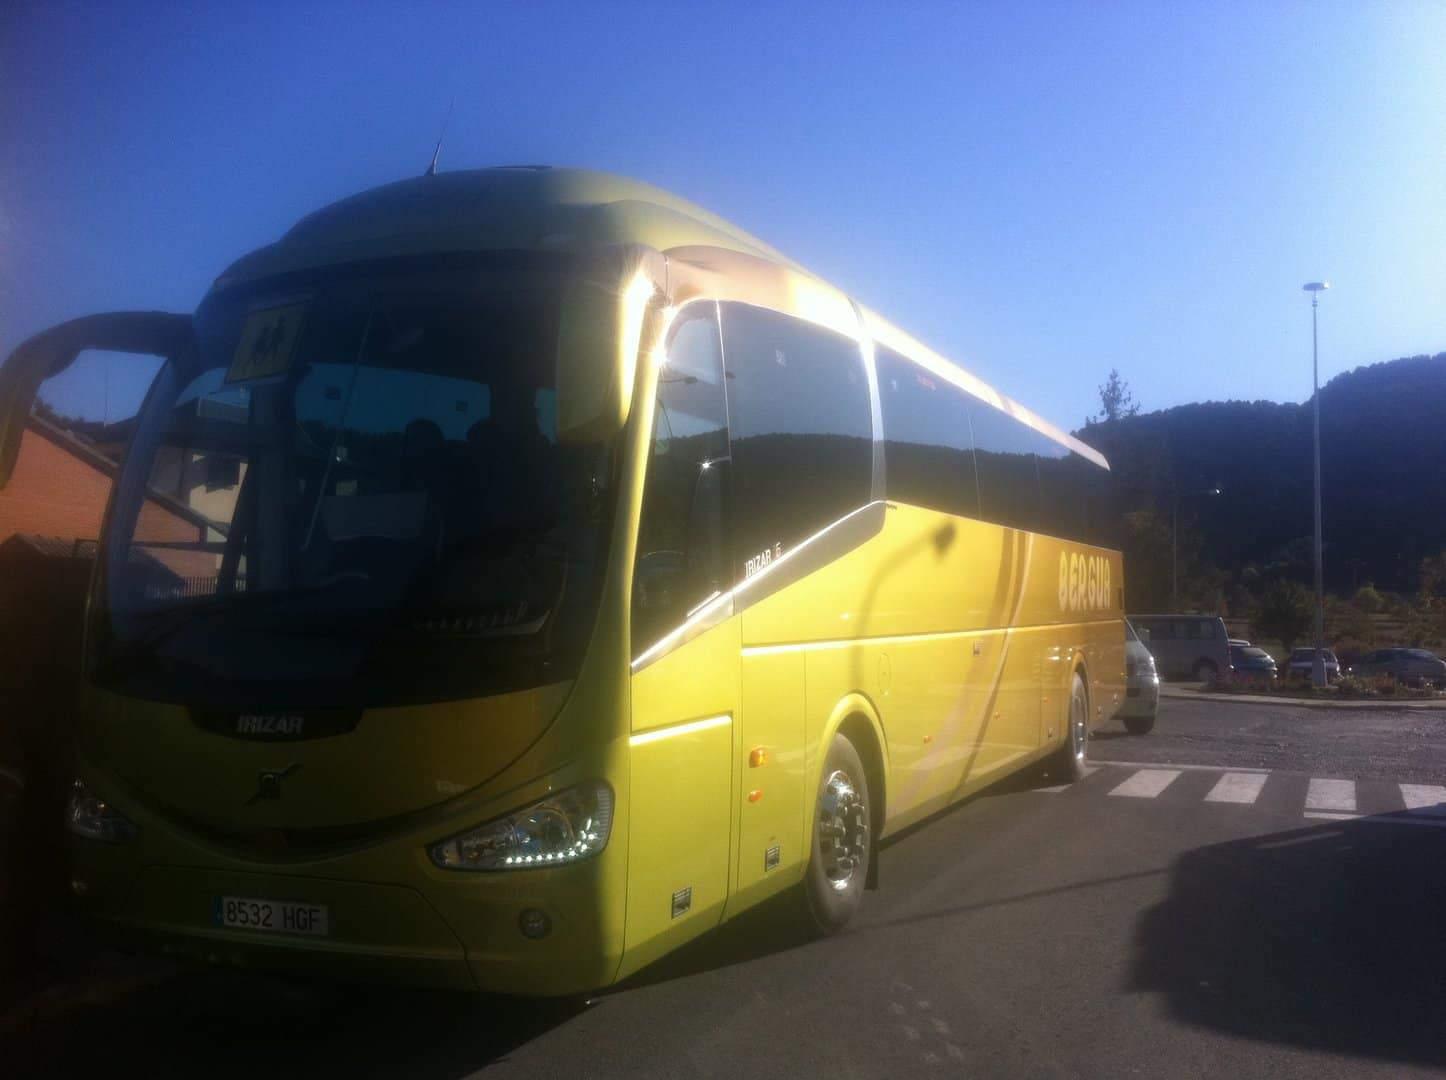 8532HGF-2 Bergua